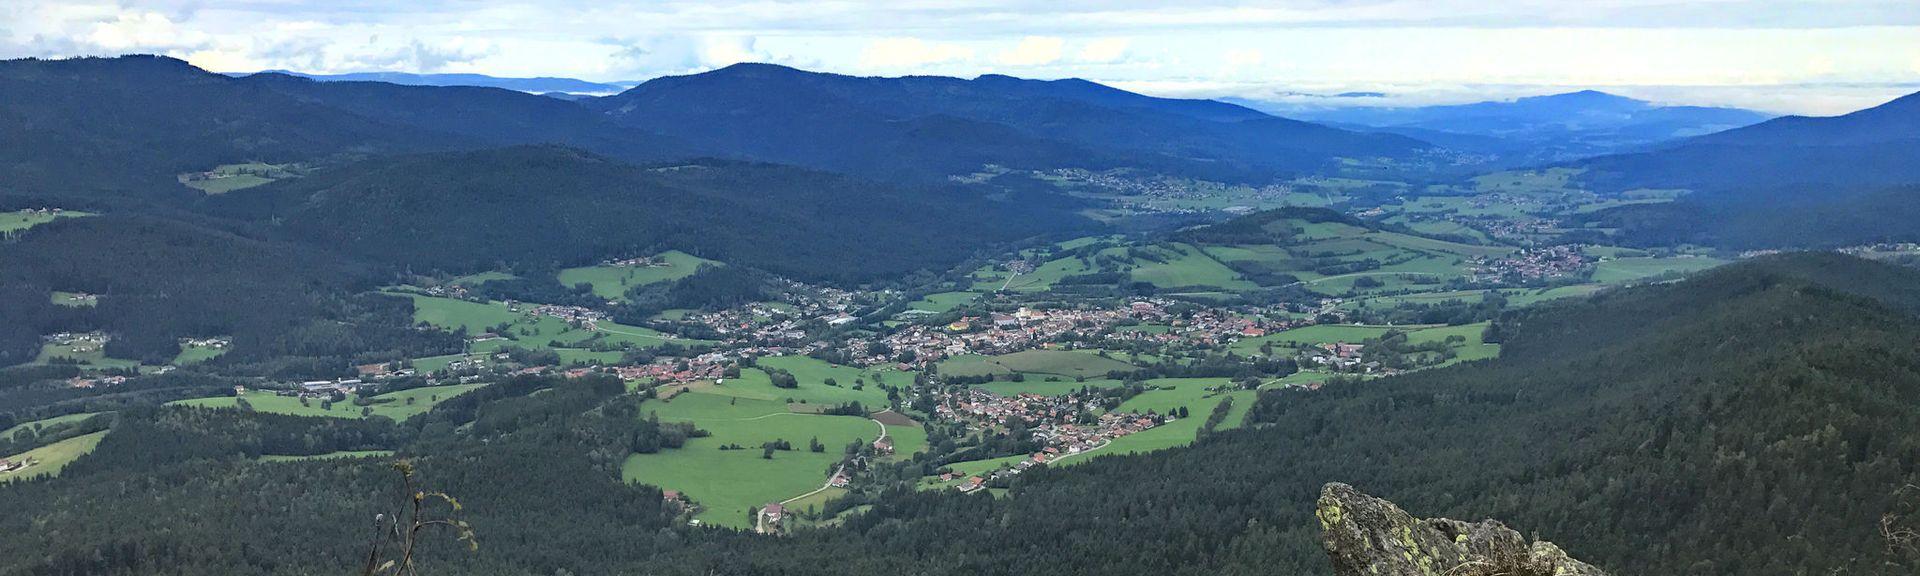 Zwiesel, Βαυαρία, Γερμανία